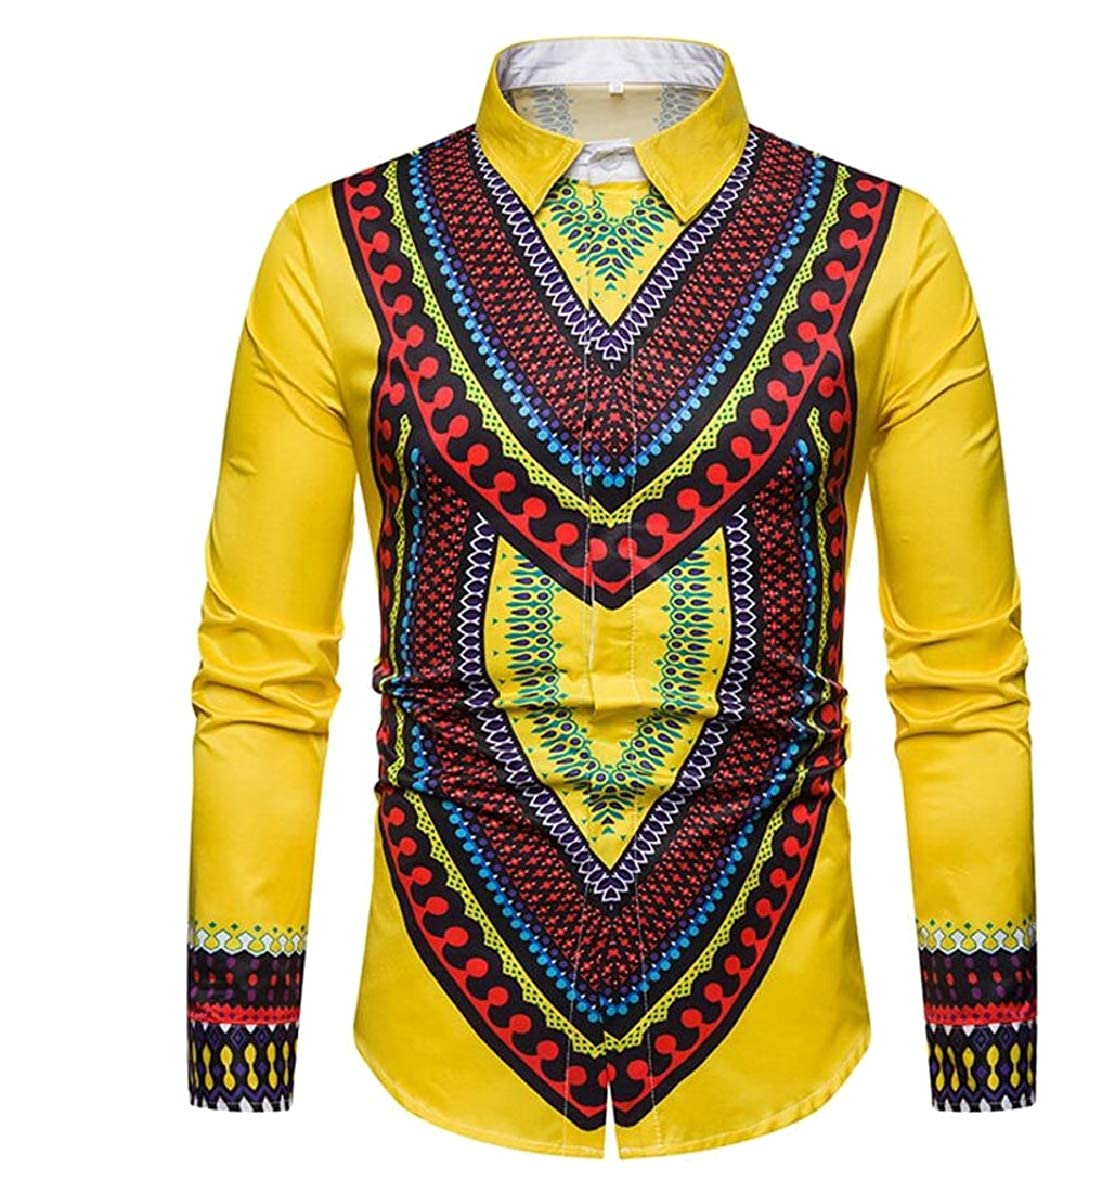 FLCH+YIGE Mens African Print Dashiki Classic Shirts Long Sleeve Button Down Shirt